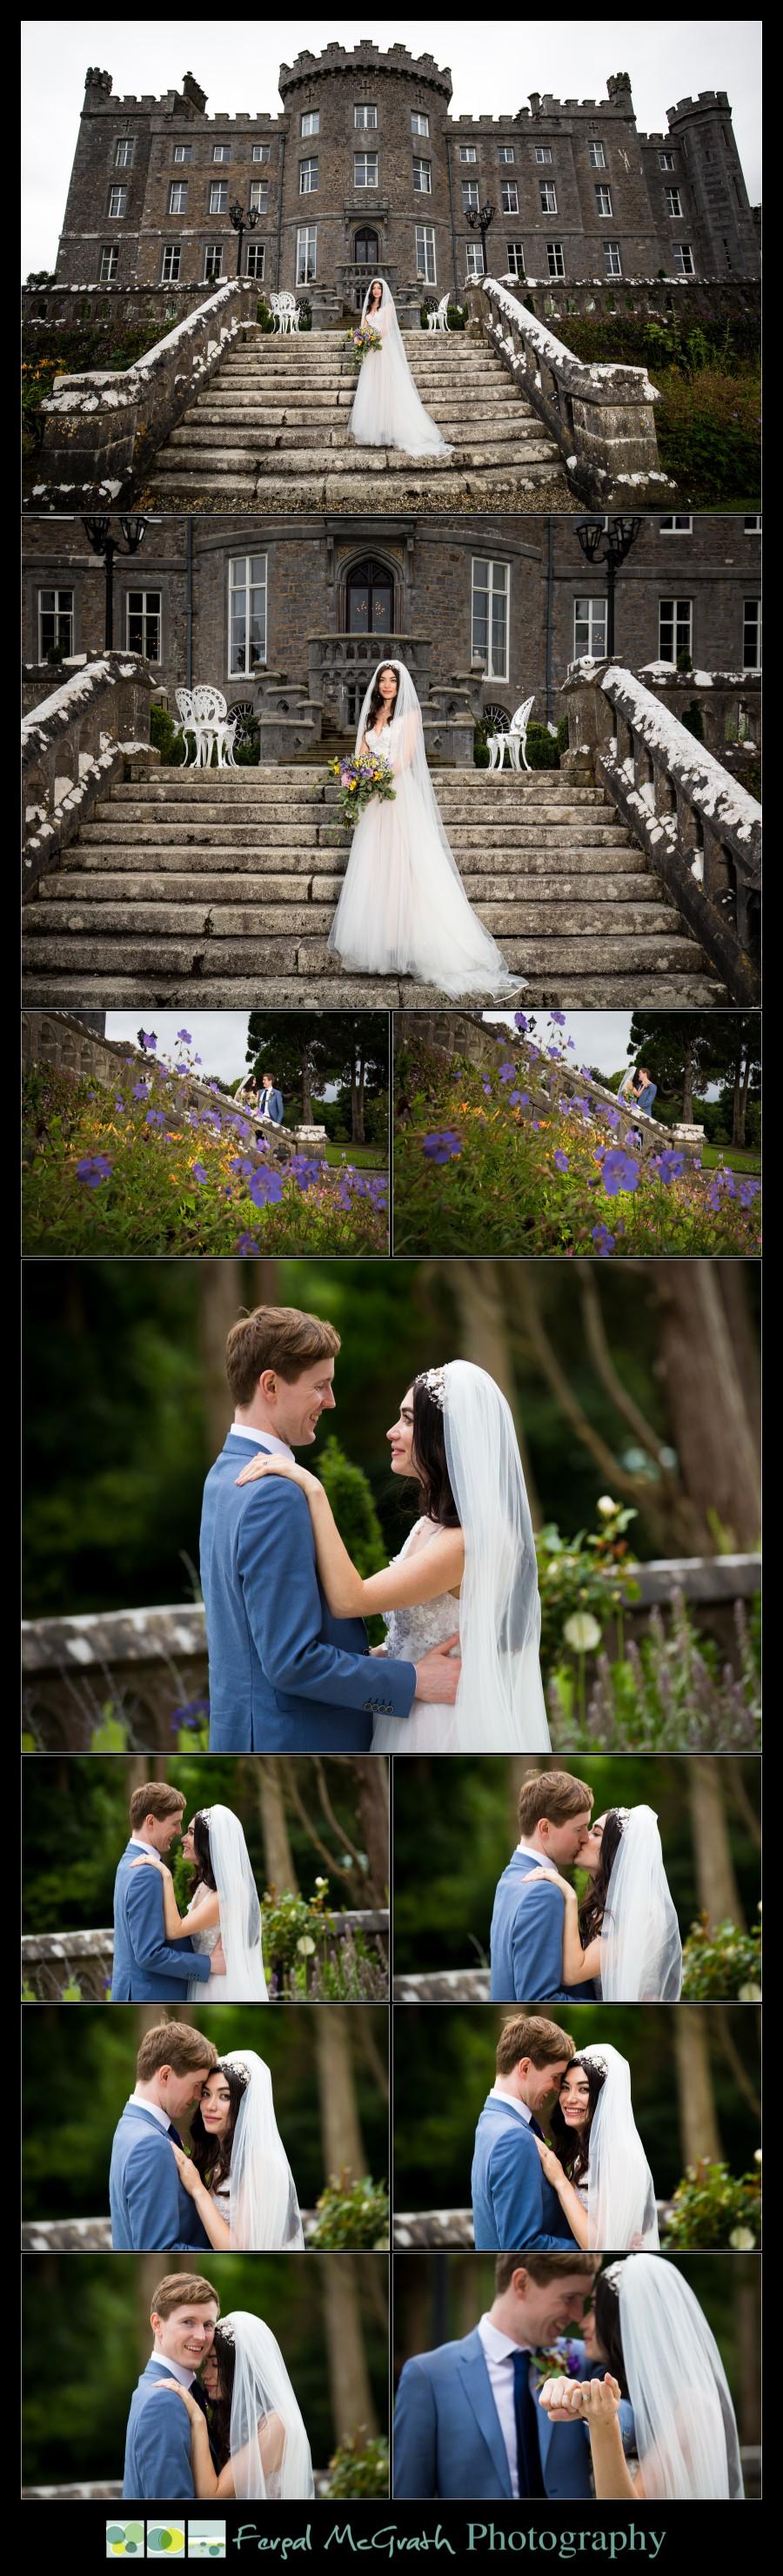 Markree Castle Wedding photos at the castle